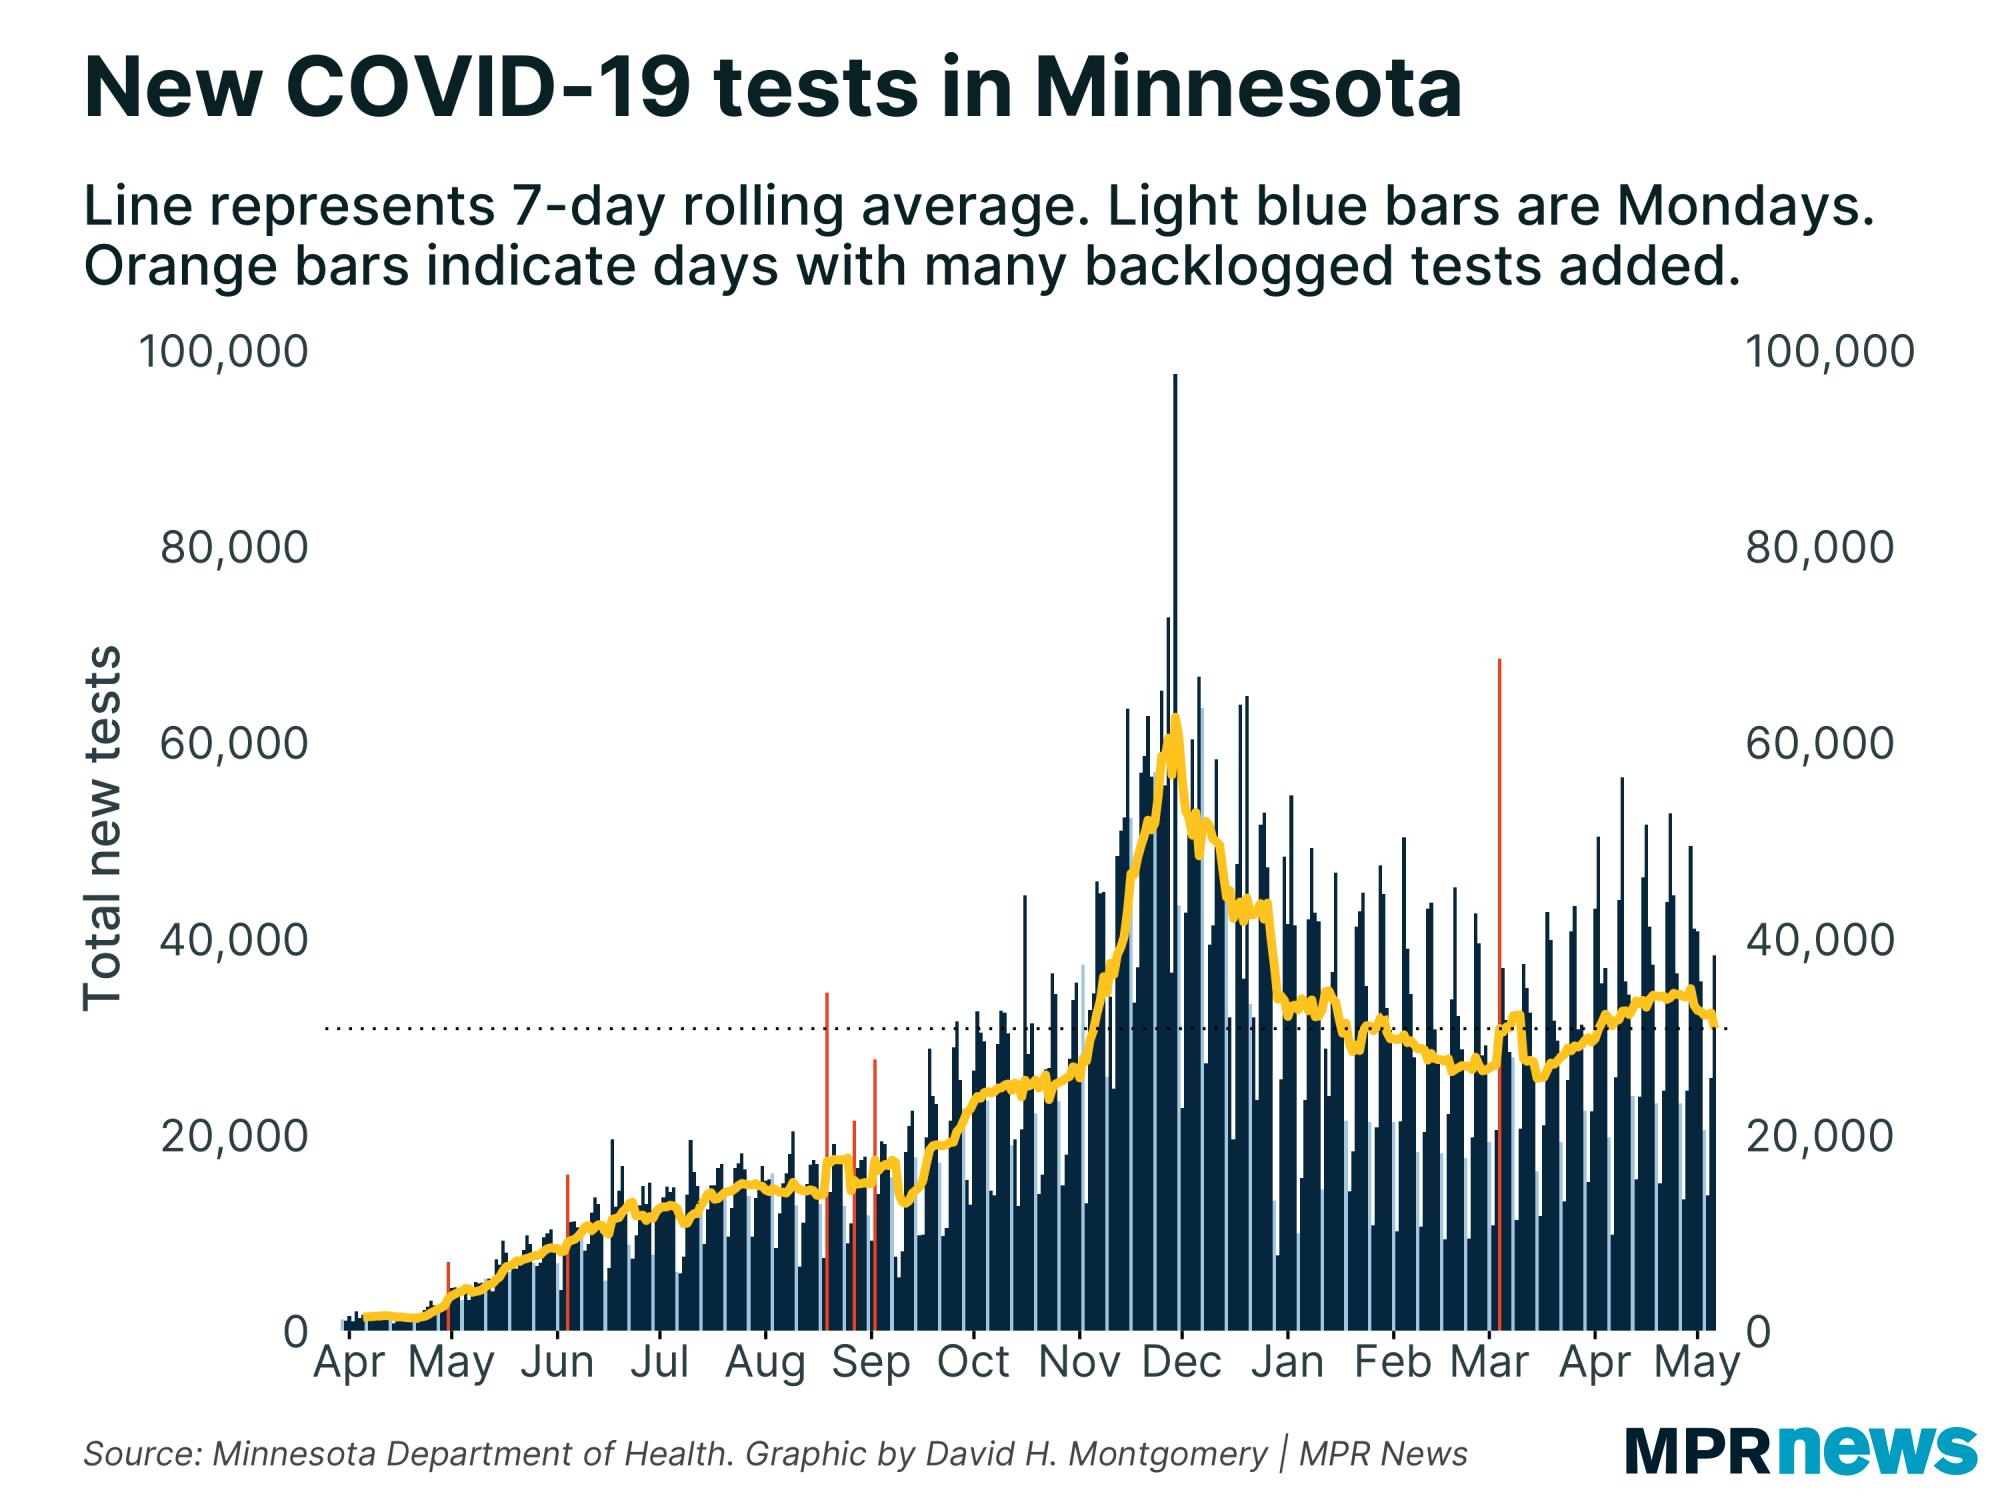 New COVID-19 tests in Minnesota